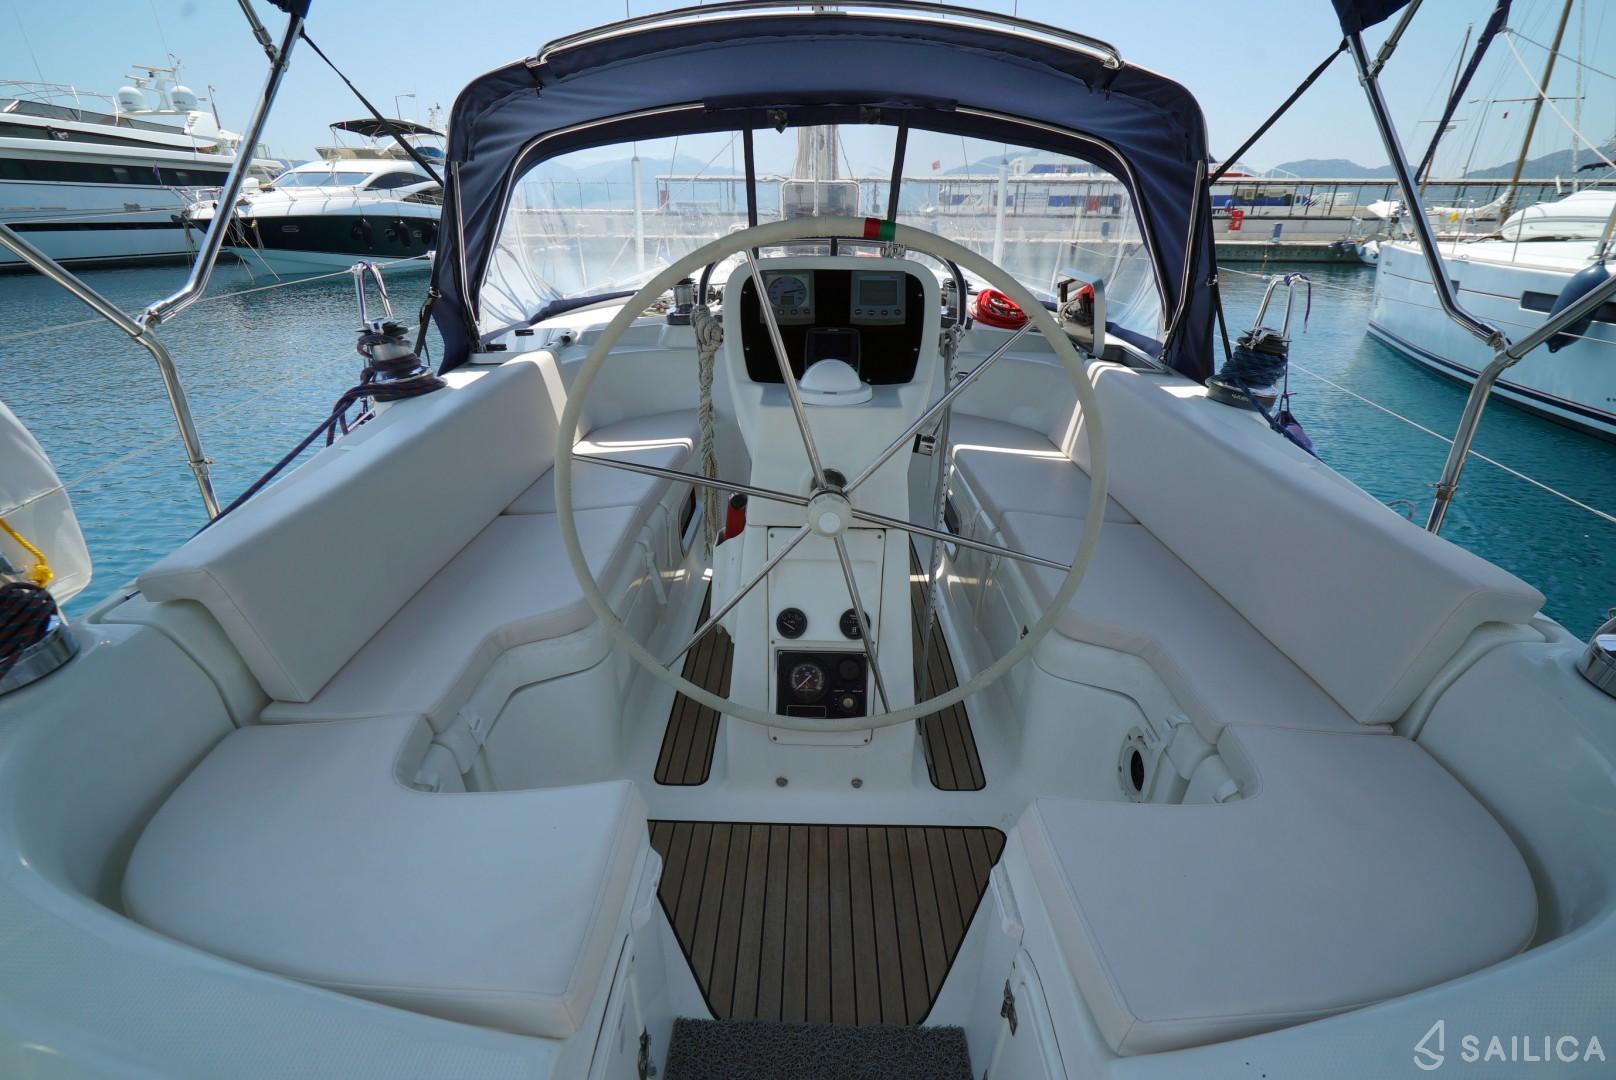 bosun chair rental covers and bows ltd bavaria 42 for rent in marmaris aegean sea